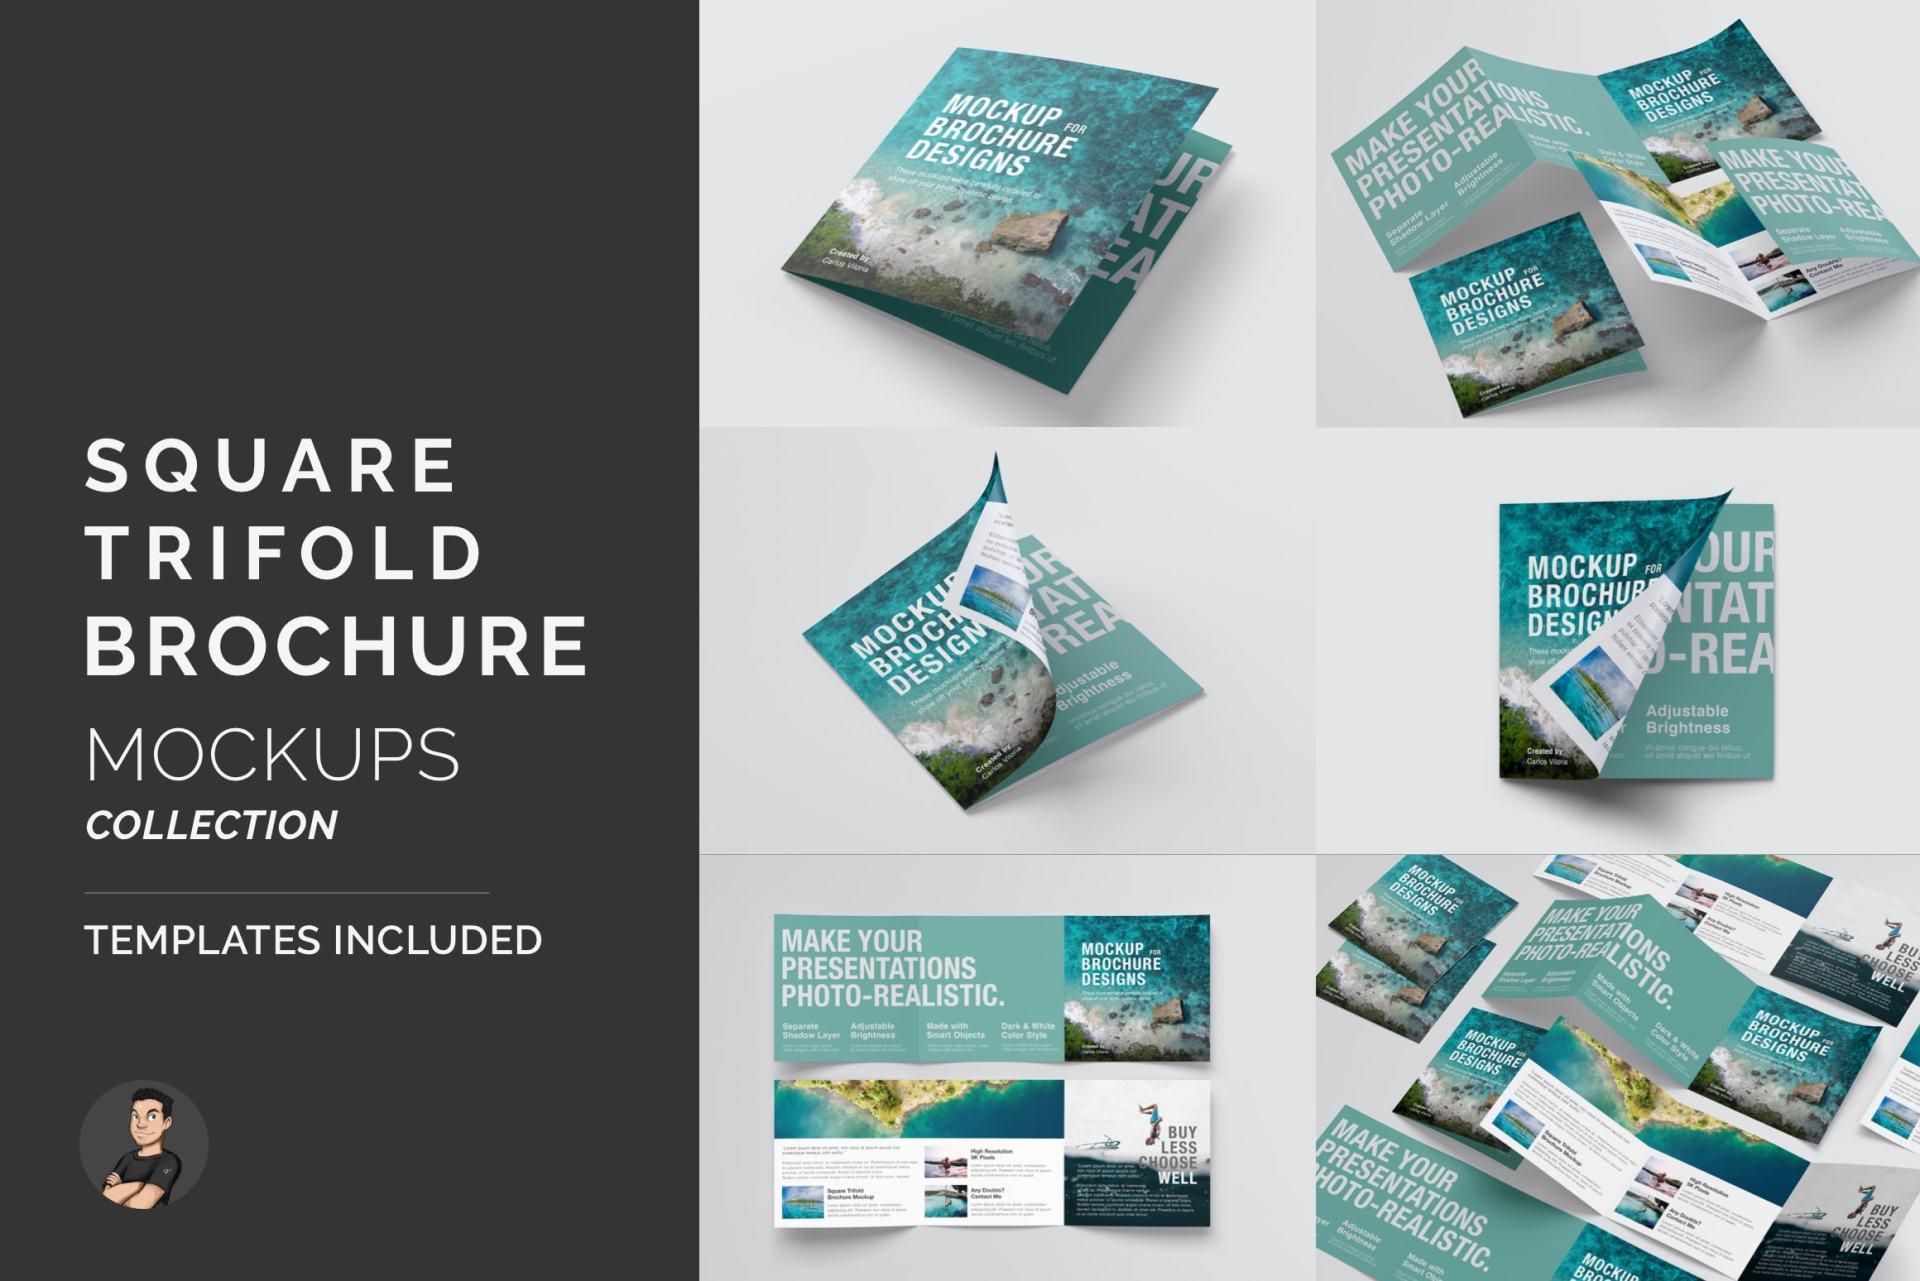 Square Trifold Brochure Mockups Pack